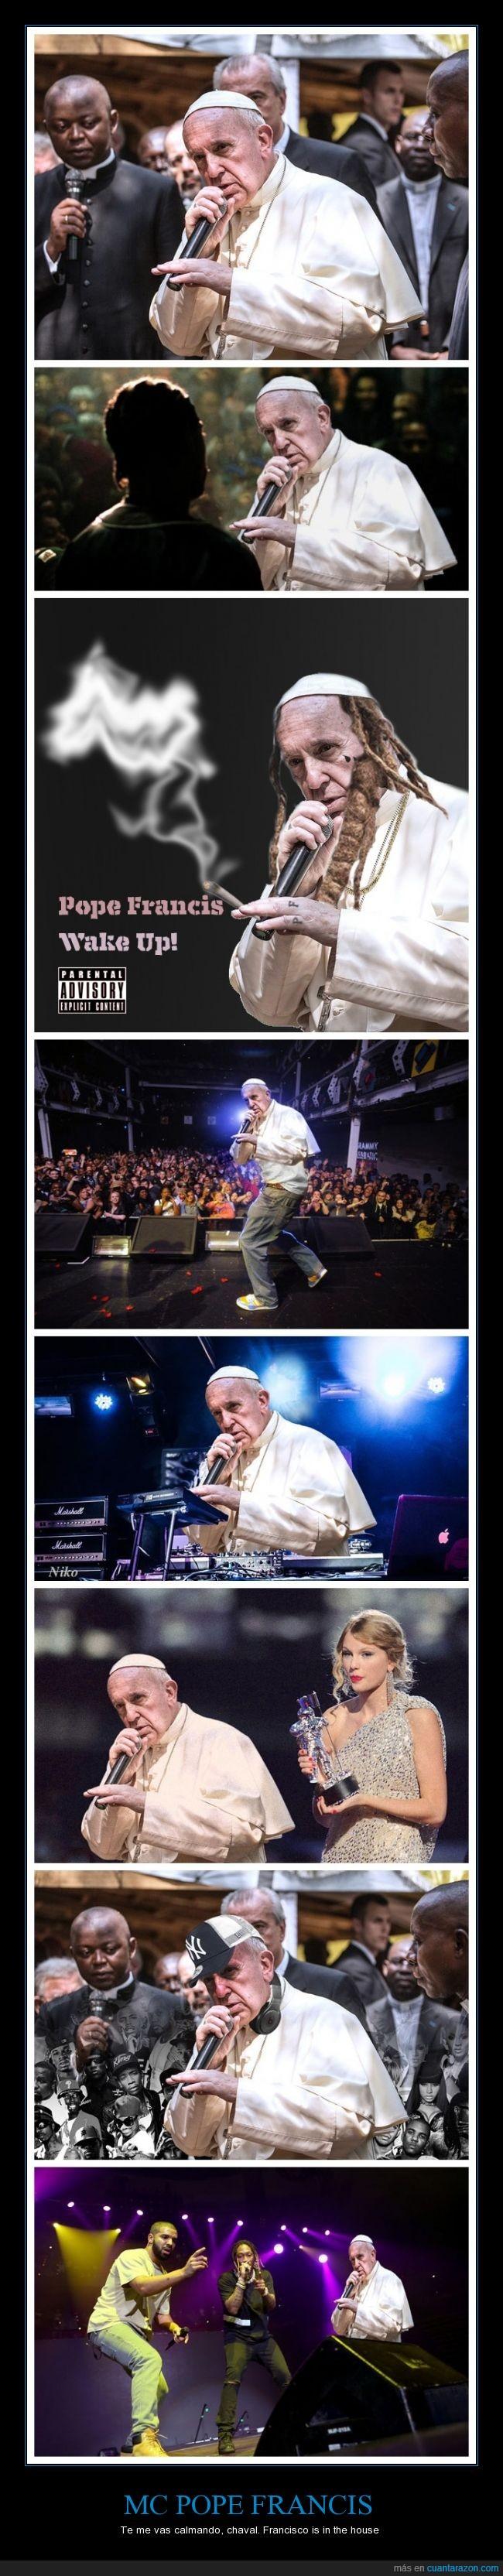 chop,francis,francisco,mc dinero,papa,pope,rap,rapero